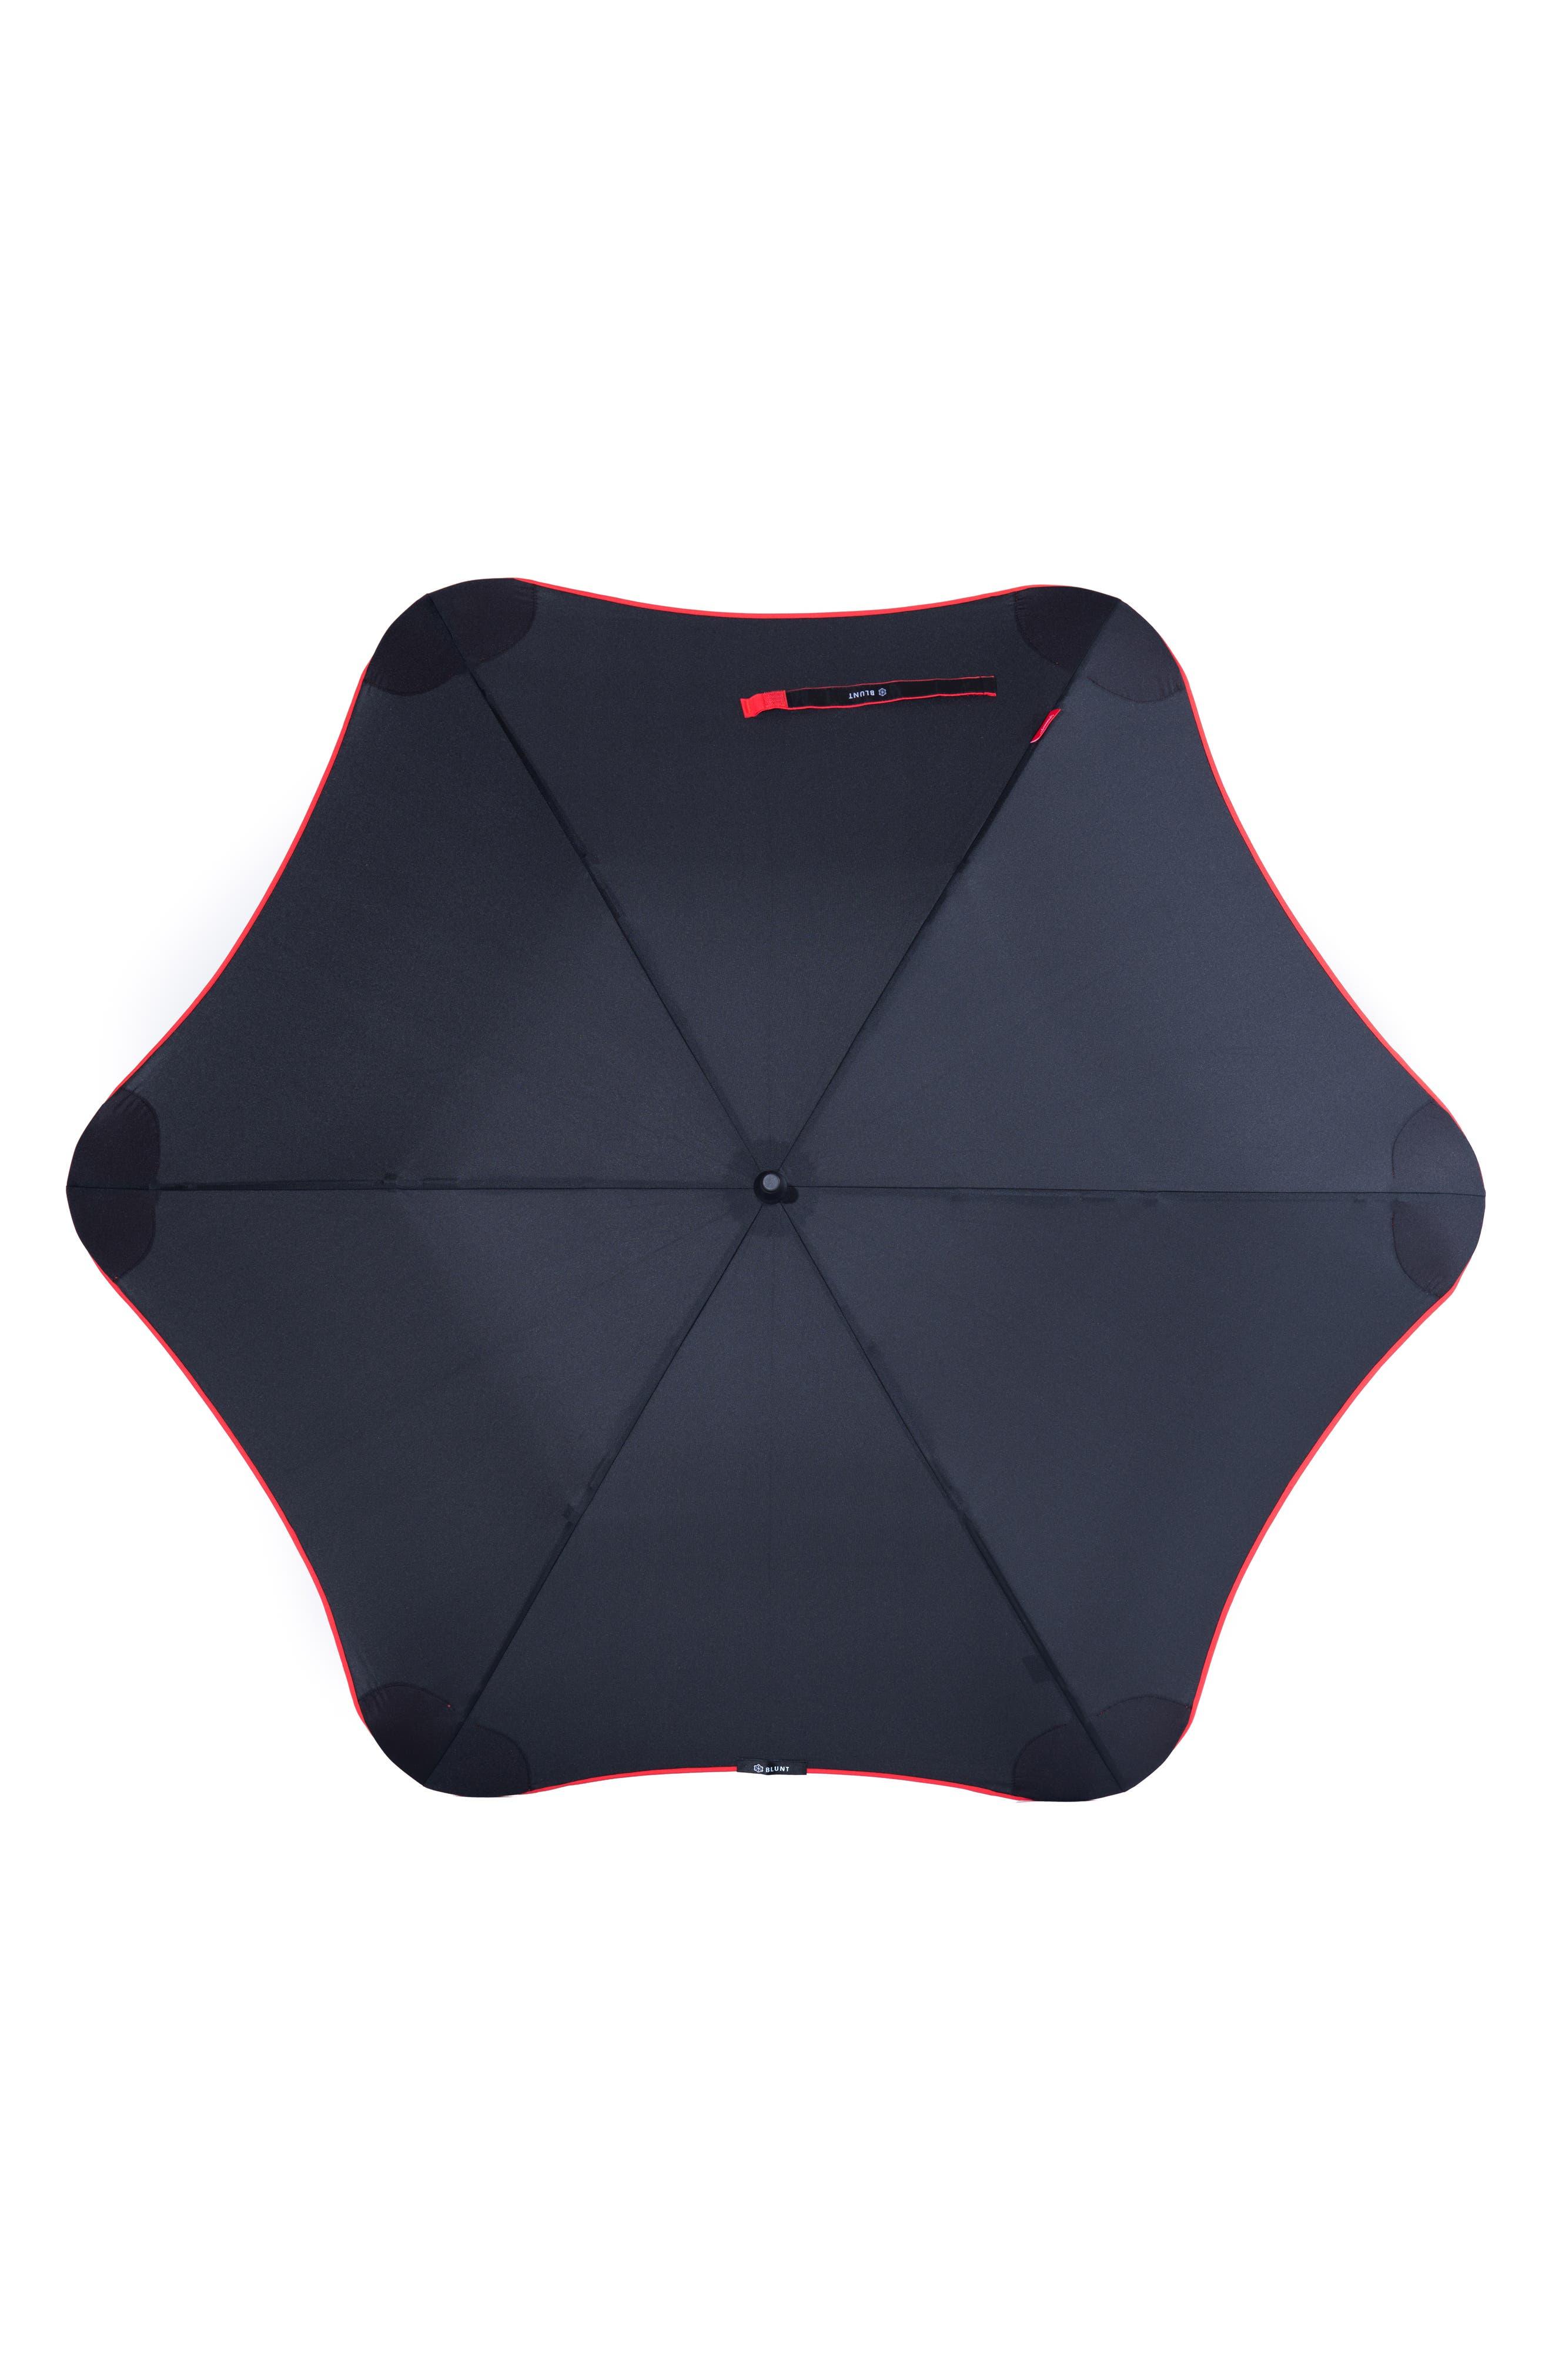 Classic Umbrella,                             Alternate thumbnail 3, color,                             001